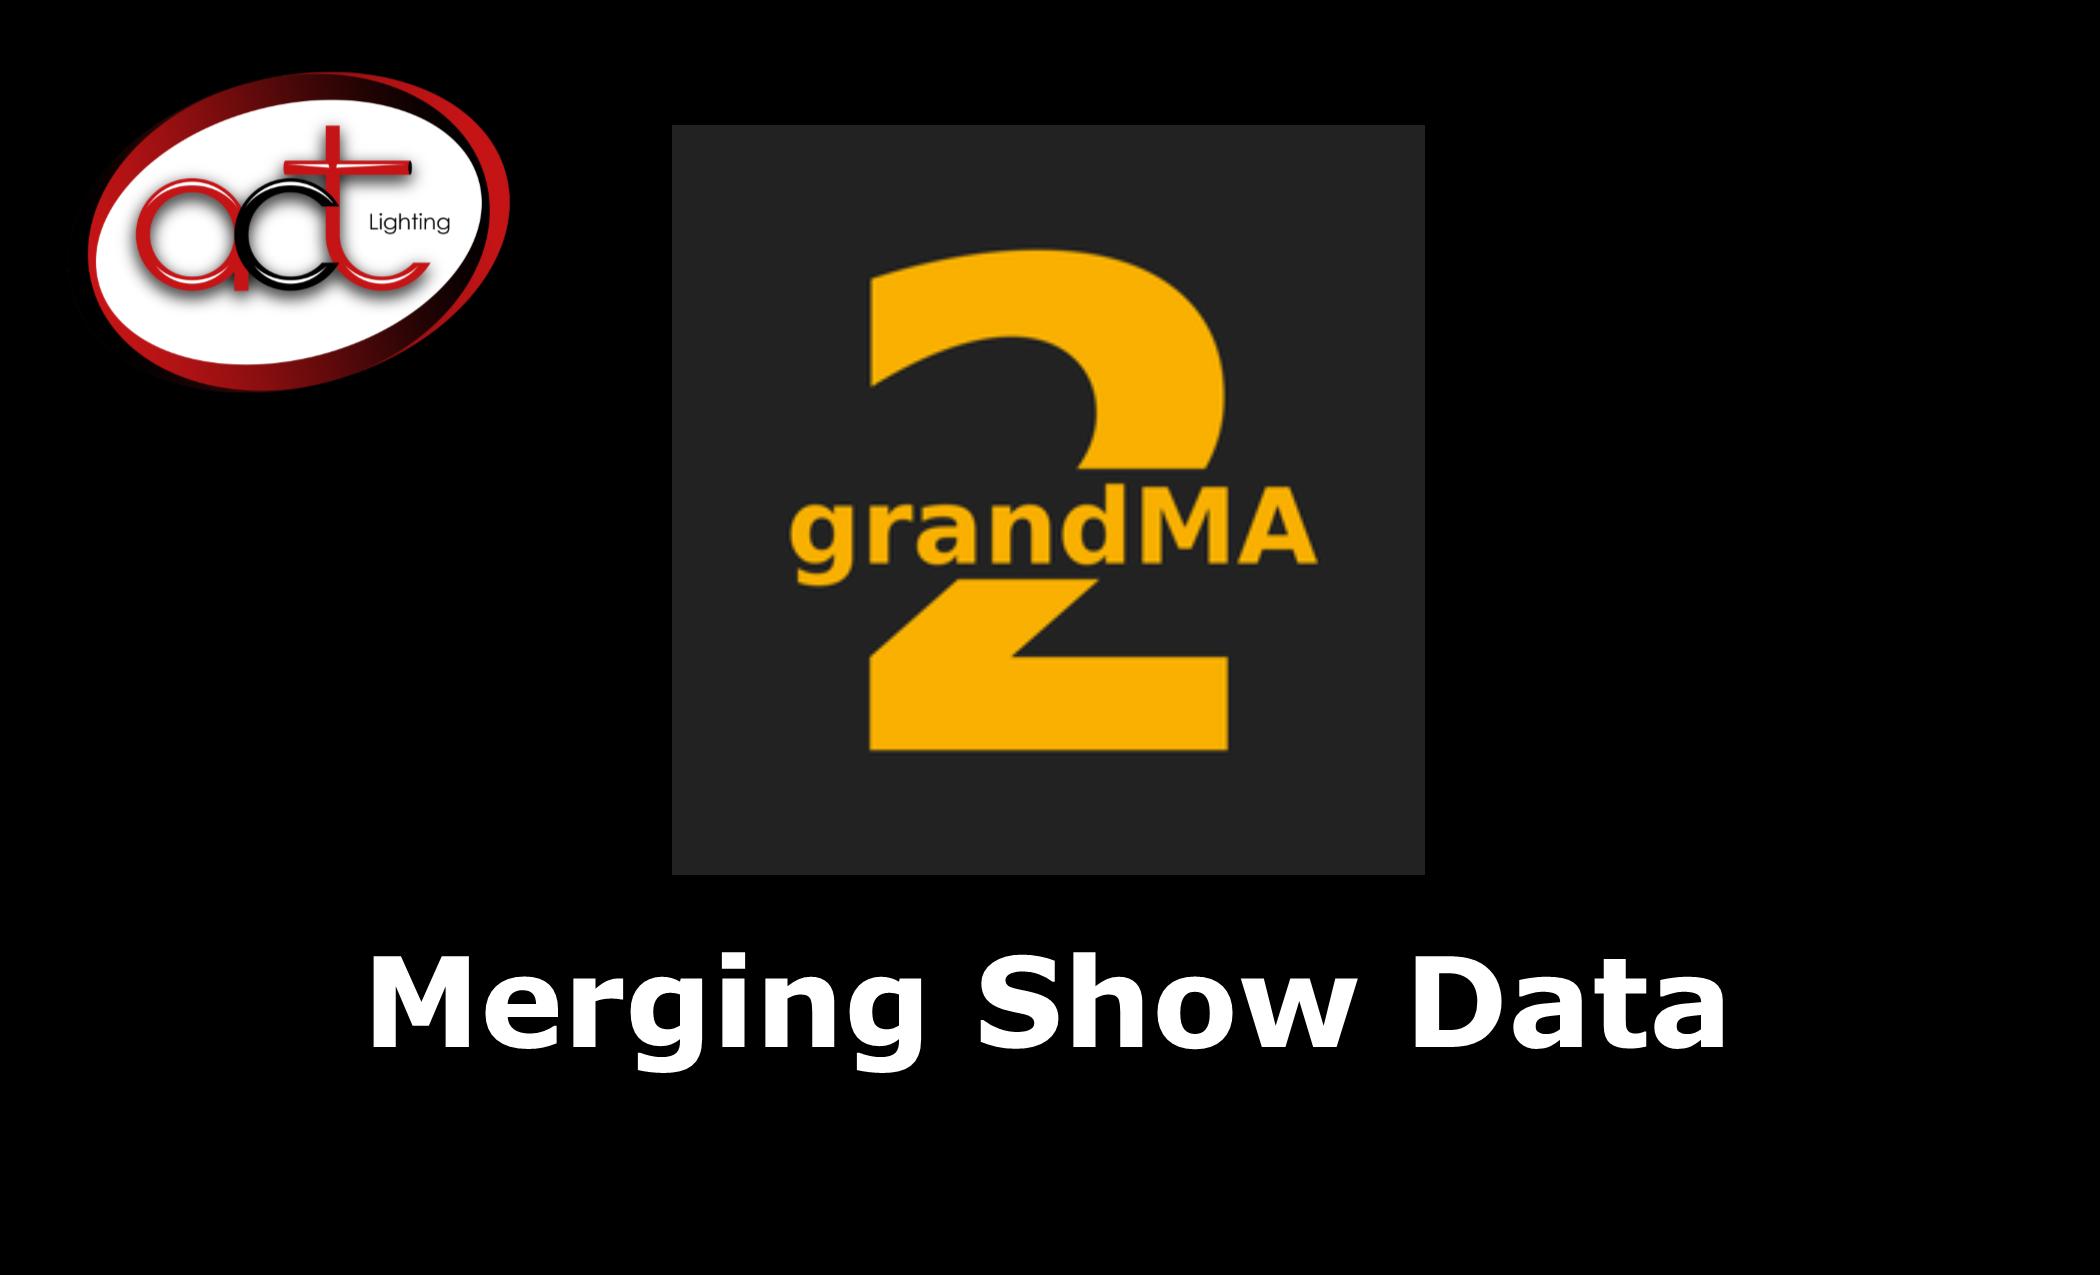 grandMA2 Merging Show Data